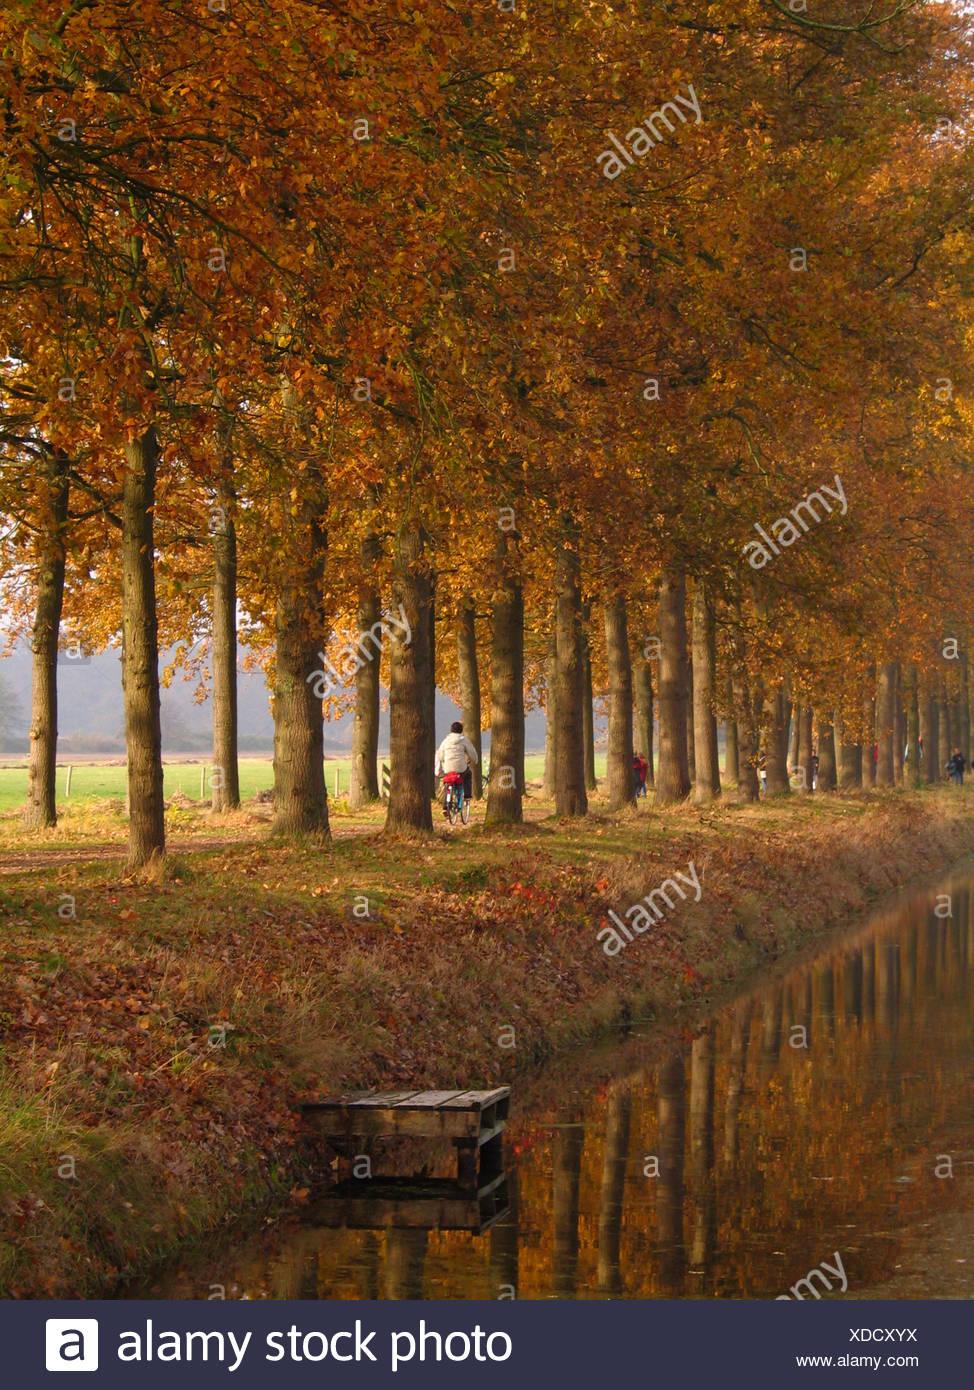 autumn, coloured deciduous trees near s'Graveland (region Gooi between Hilversum and Amsterdam Stock Photo